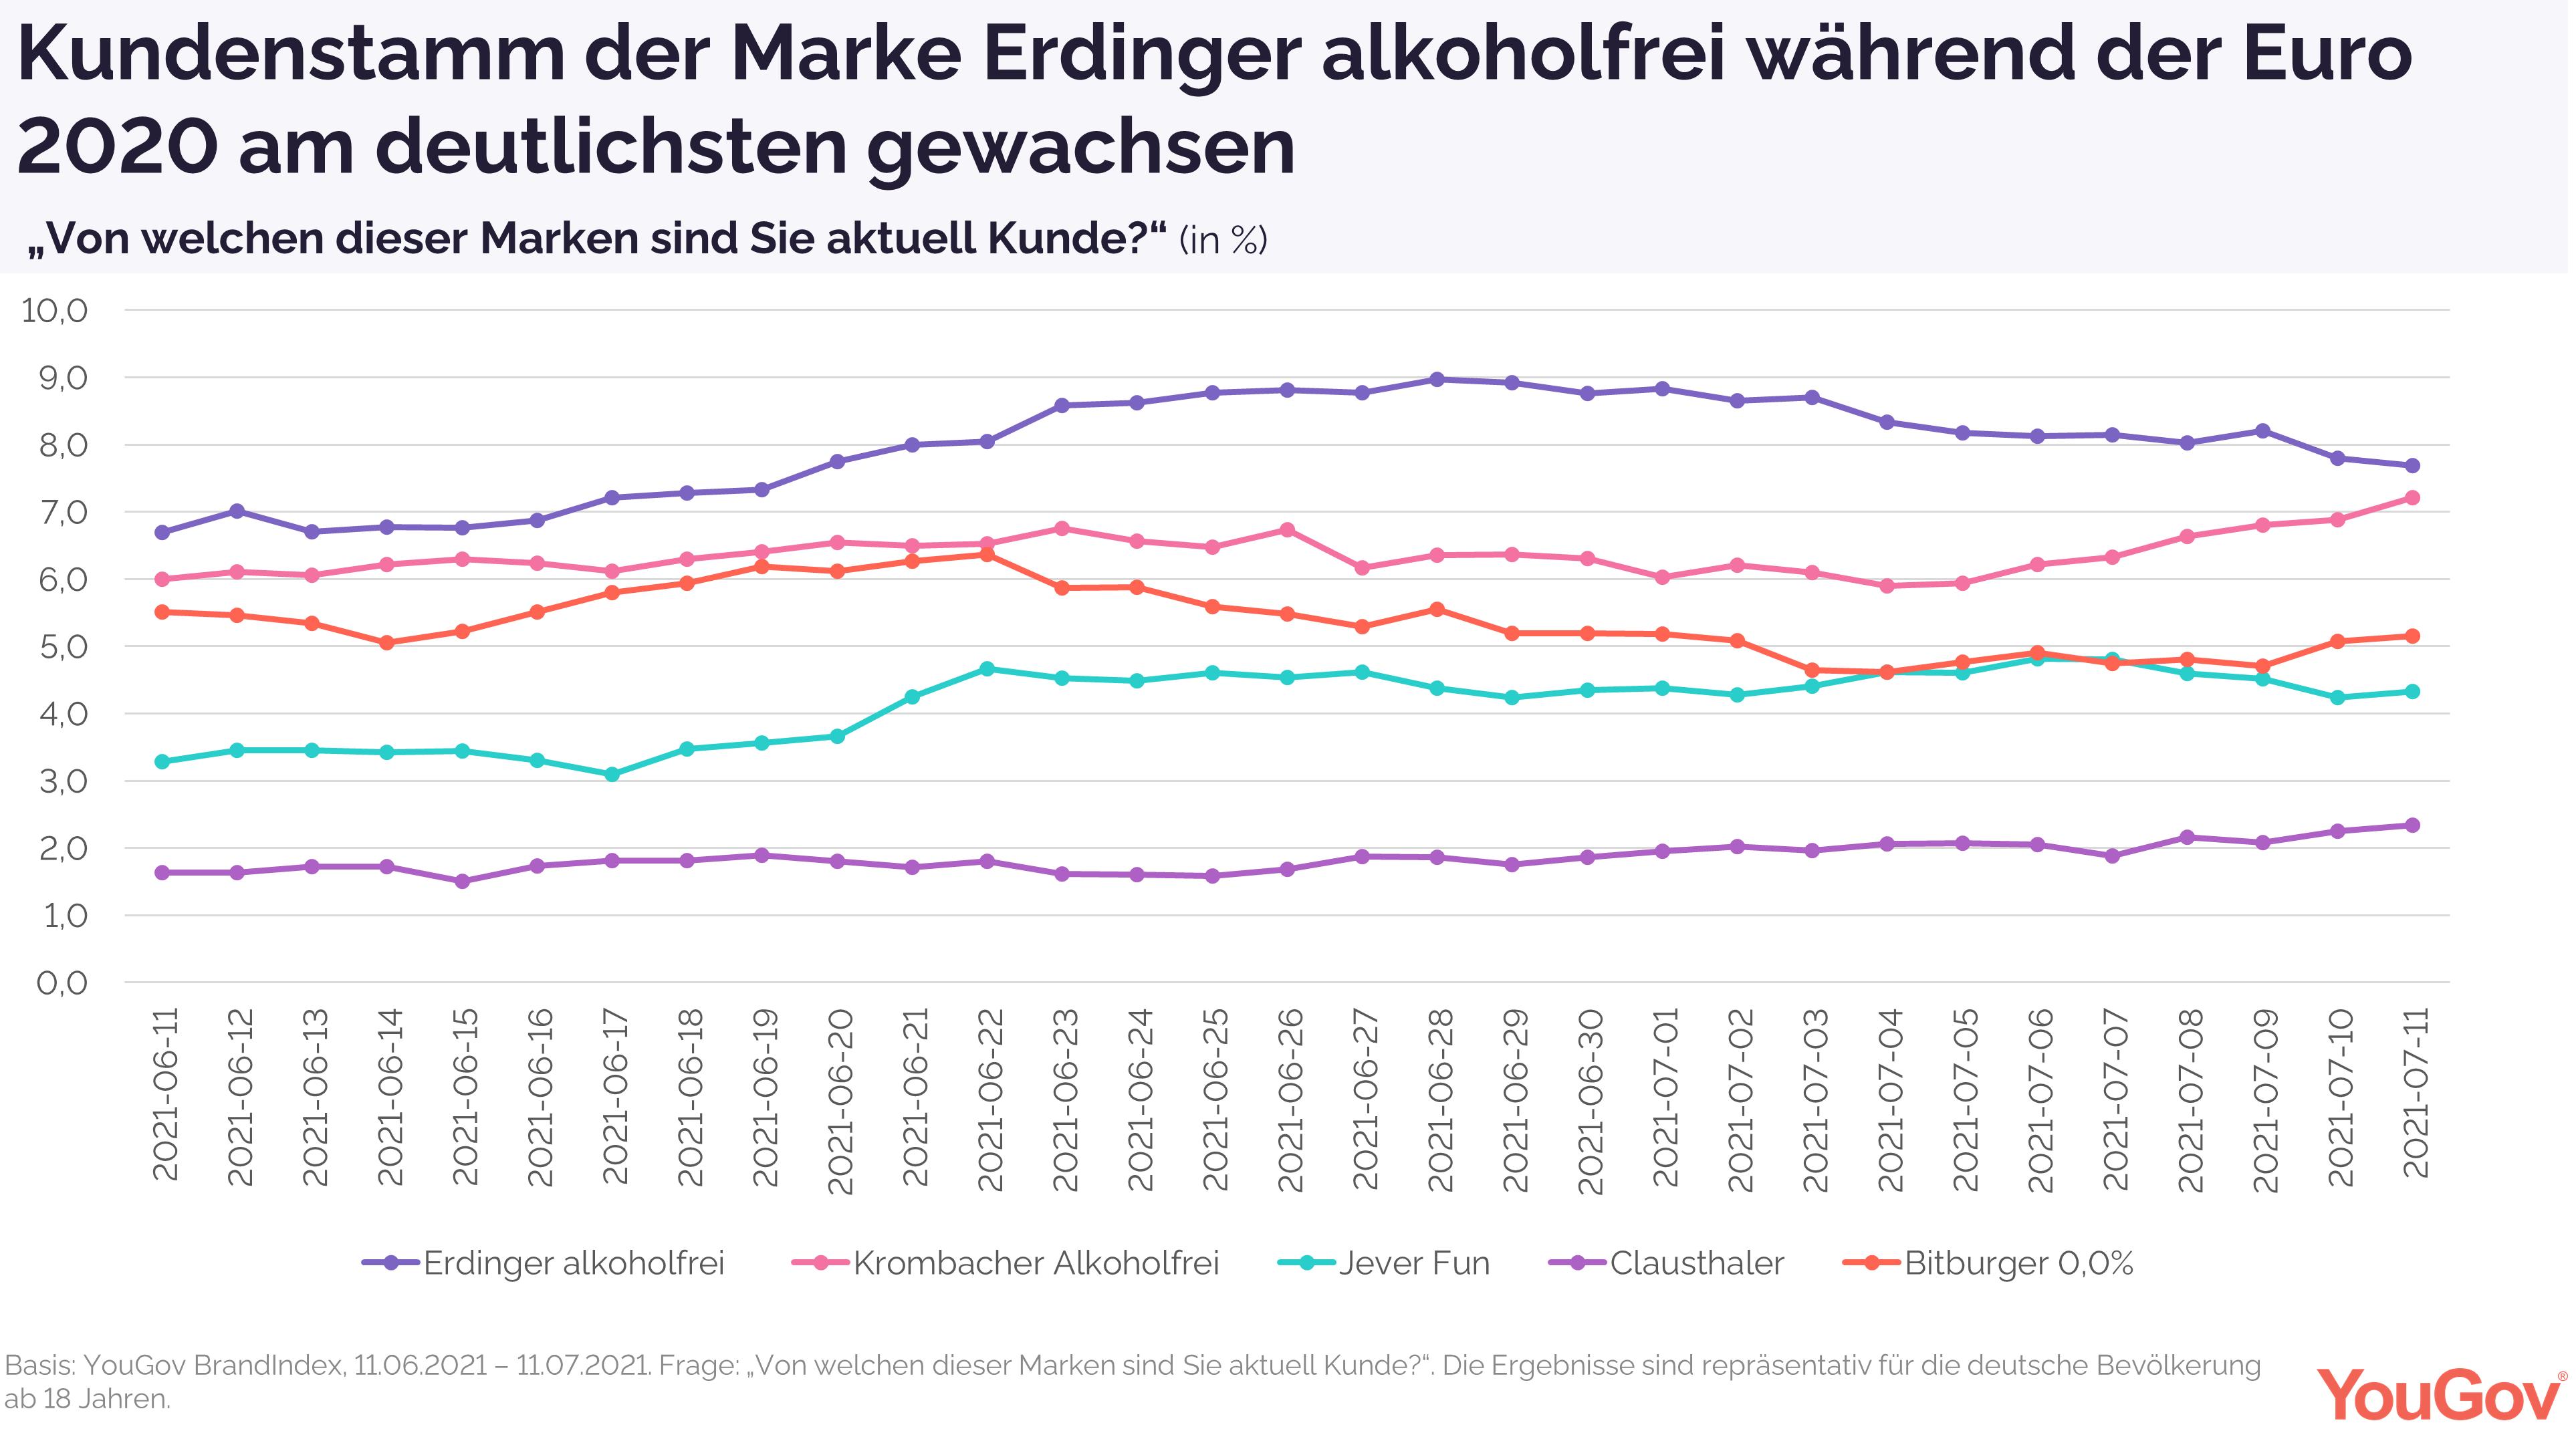 Aktuelle Kunden Alkoholfreie Biere Euro 2020